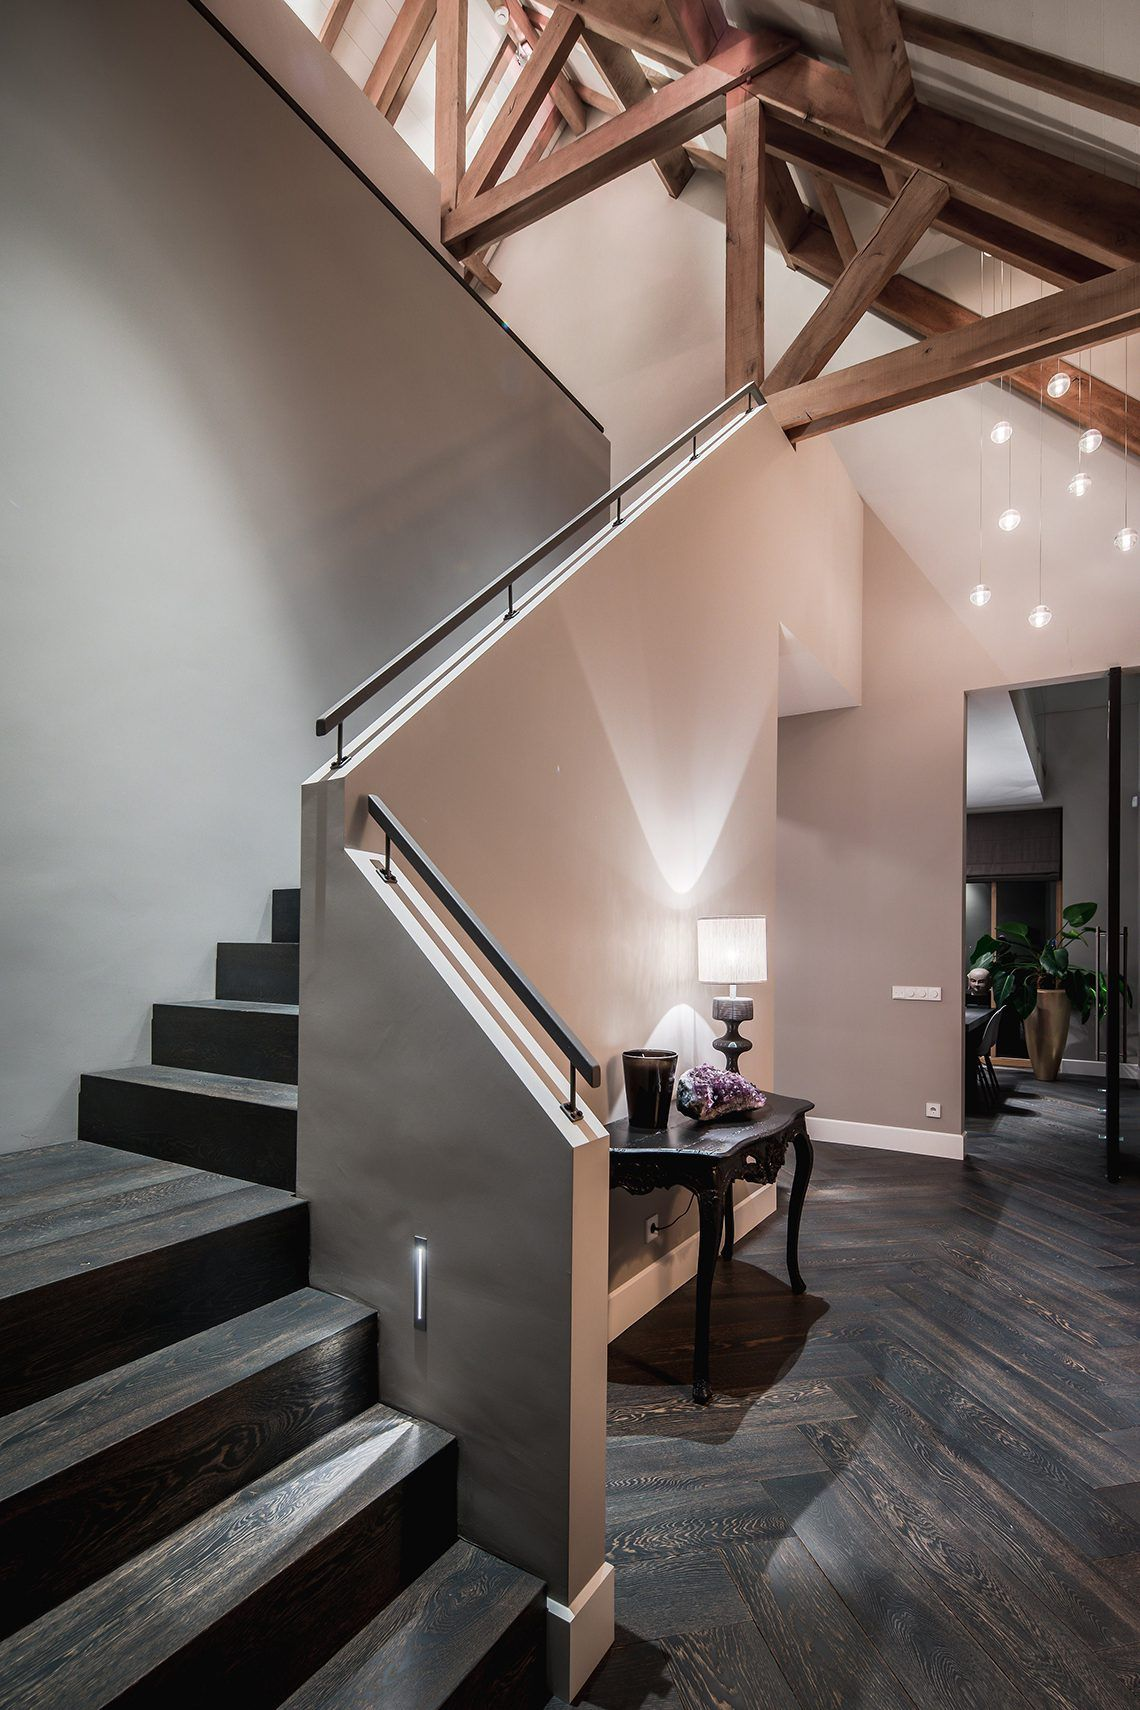 Francois Hannes Villa K Hoog Exclusieve Woon En Tuin Inspiratie Treppe Haus Treppen Design Haus Innenarchitektur